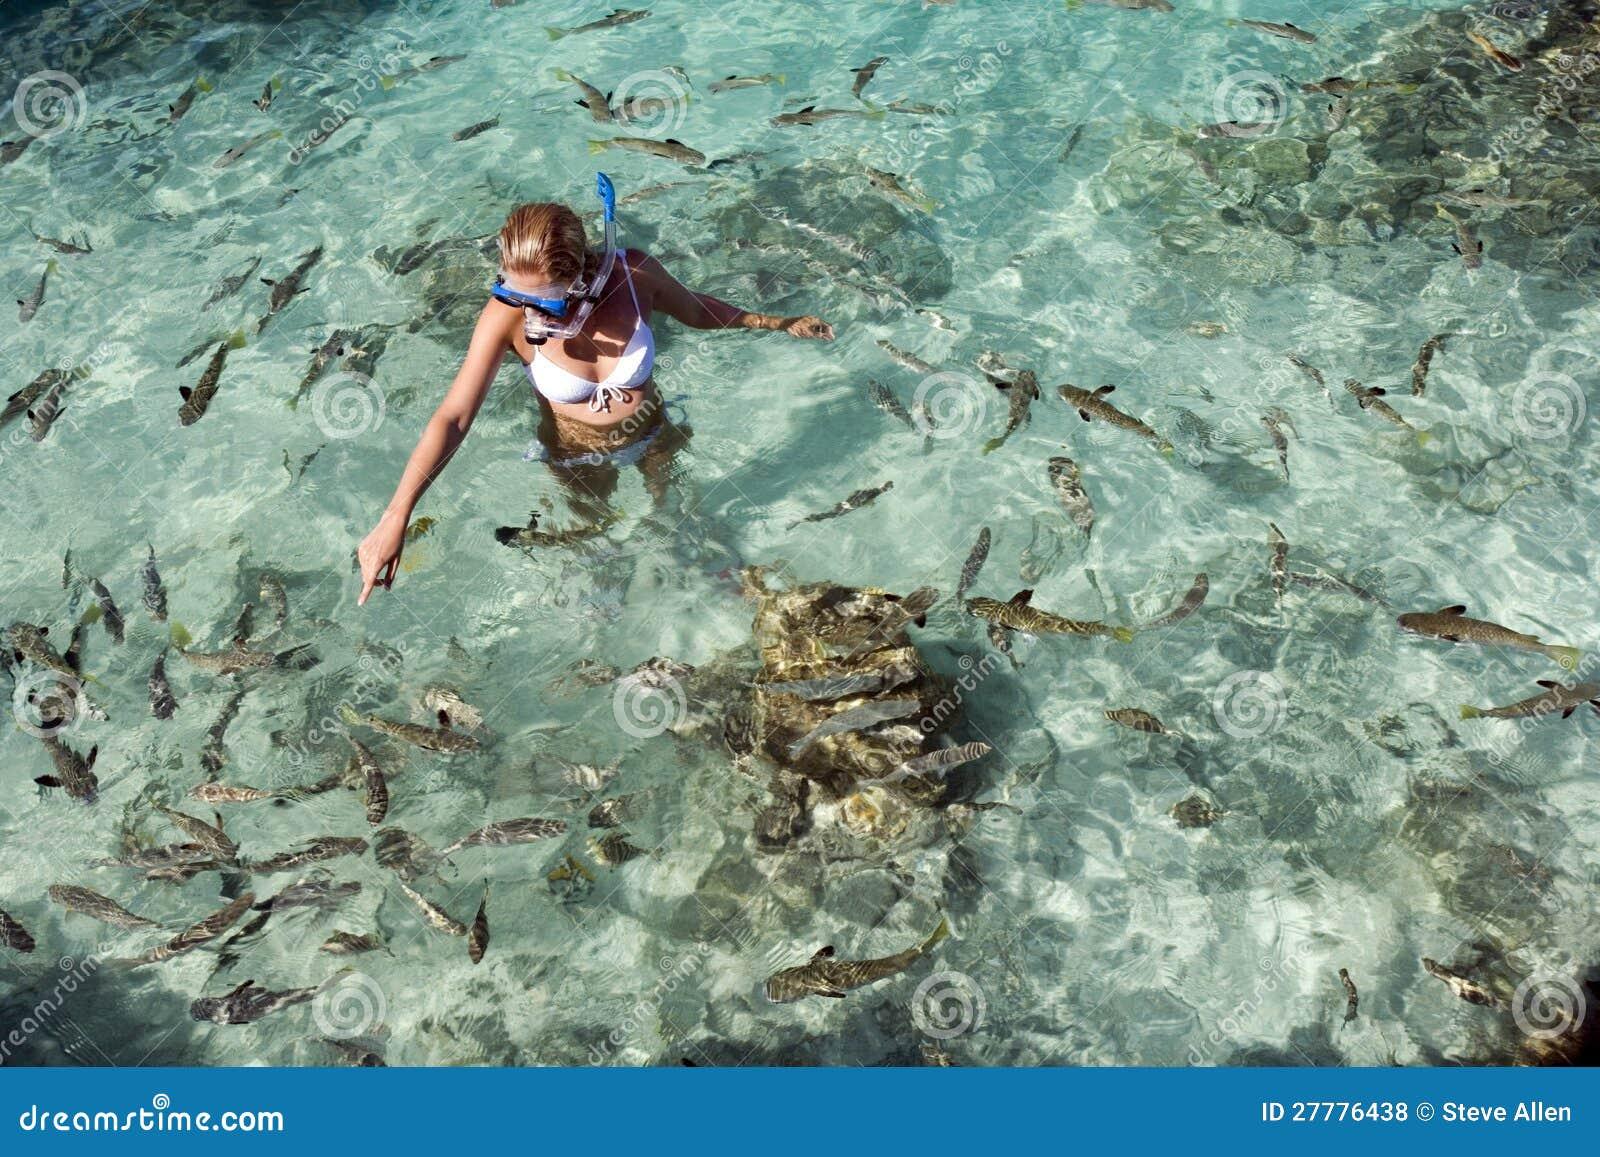 Таити - Французская Полинезия - South Pacific